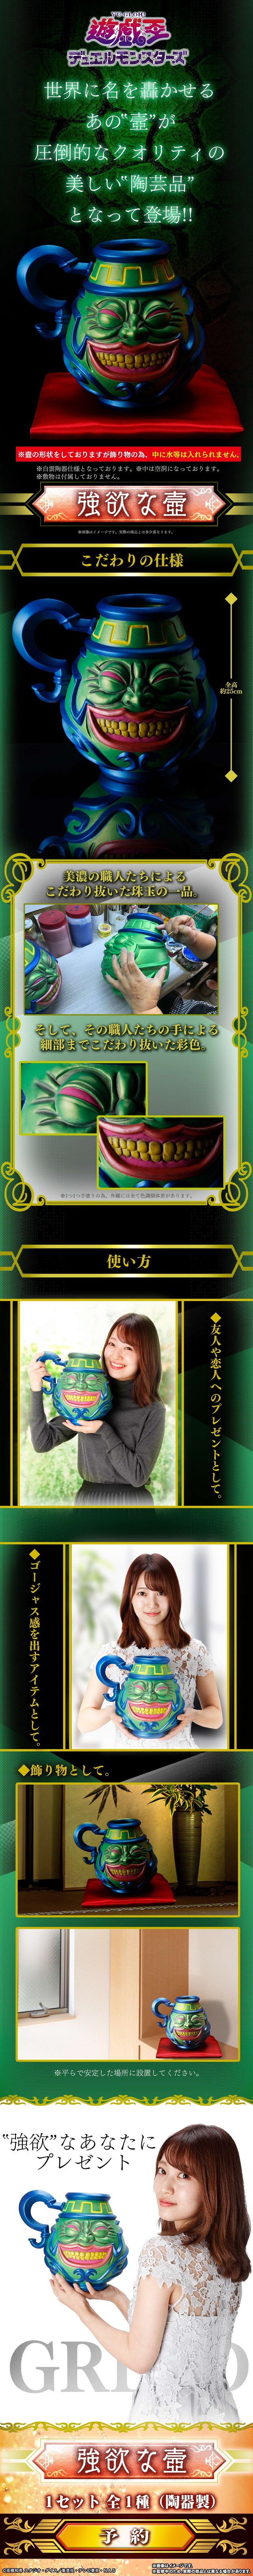 life_202004_yuugi_long2